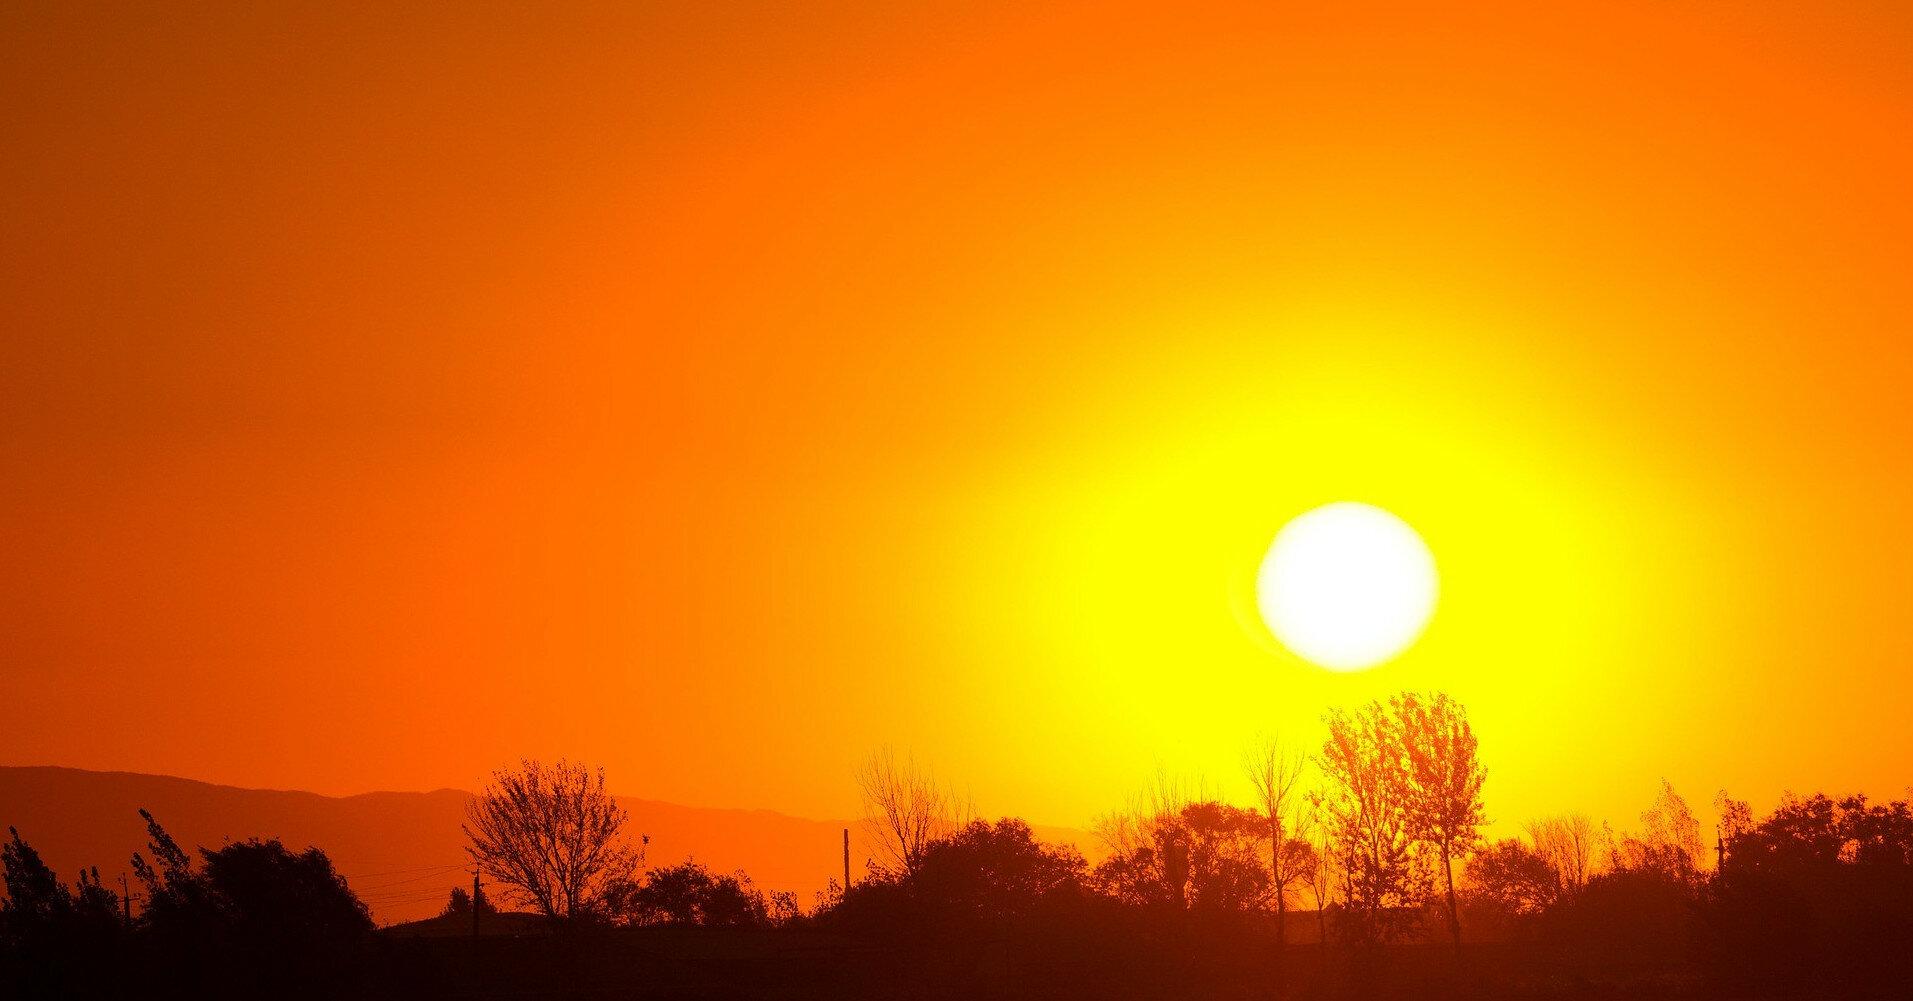 В ООН предупредили о последствиях изменения климата